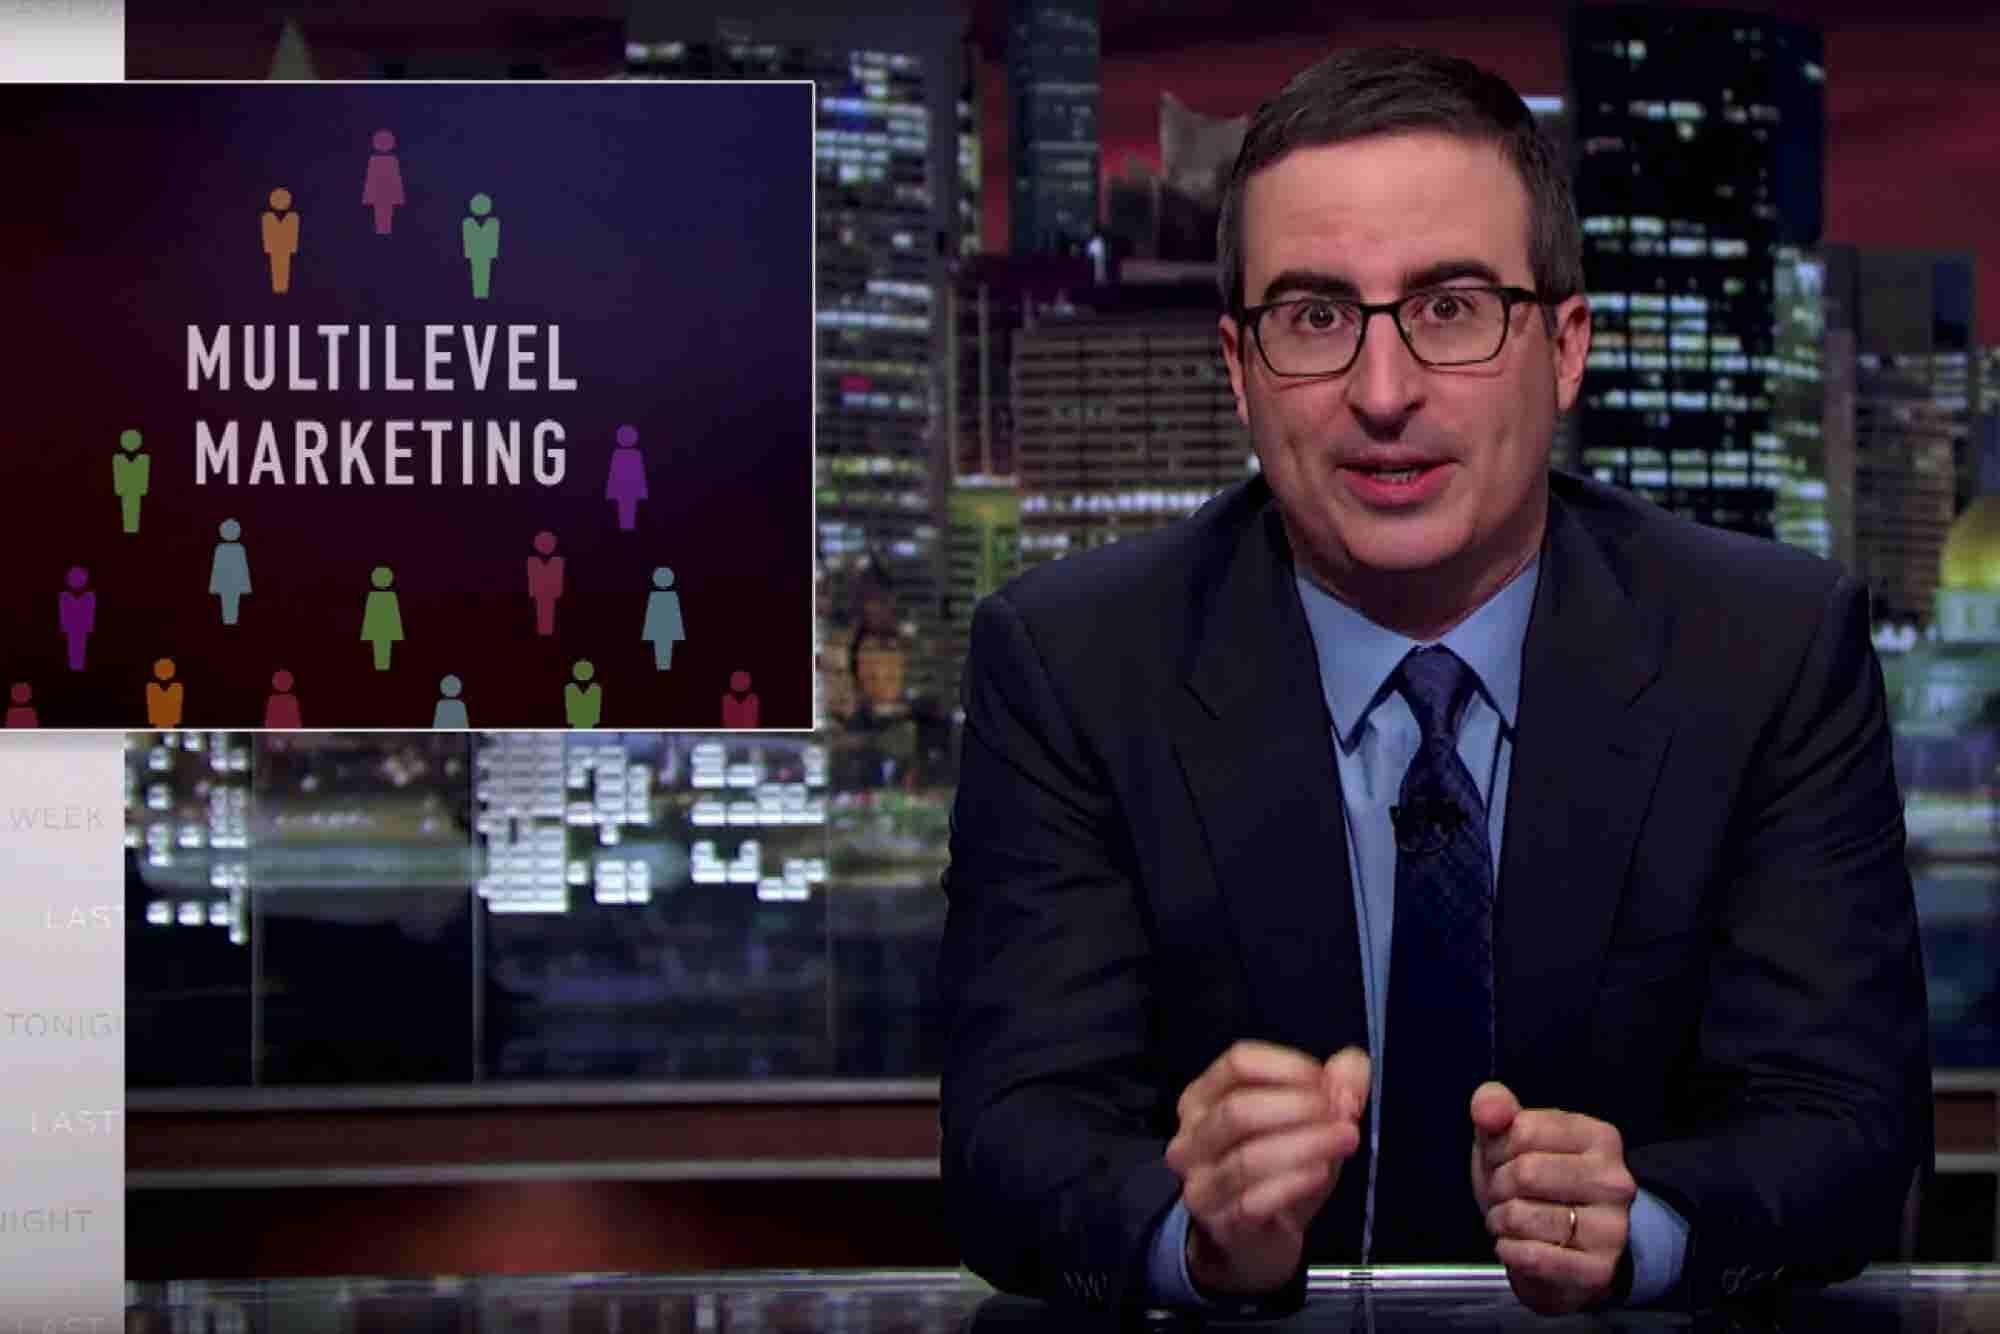 John Oliver: Multilevel Marketing Is Not a Good Path to Entrepreneurship